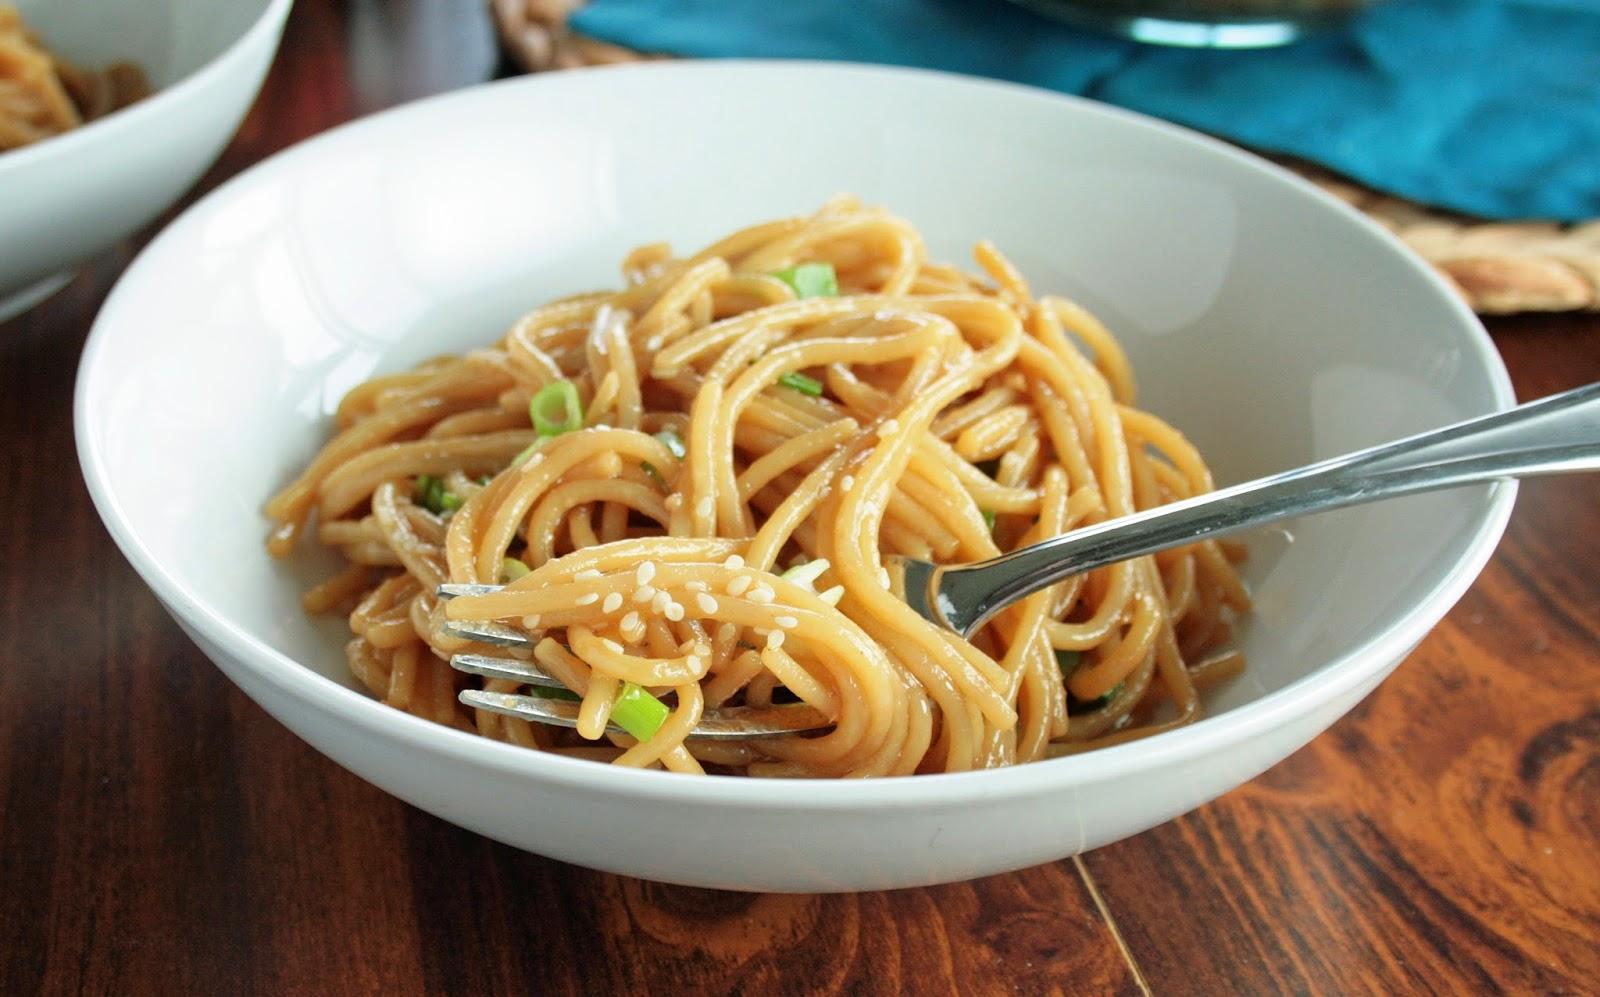 Lazy Gluten Free: Beyond Easy Sesame Noodles